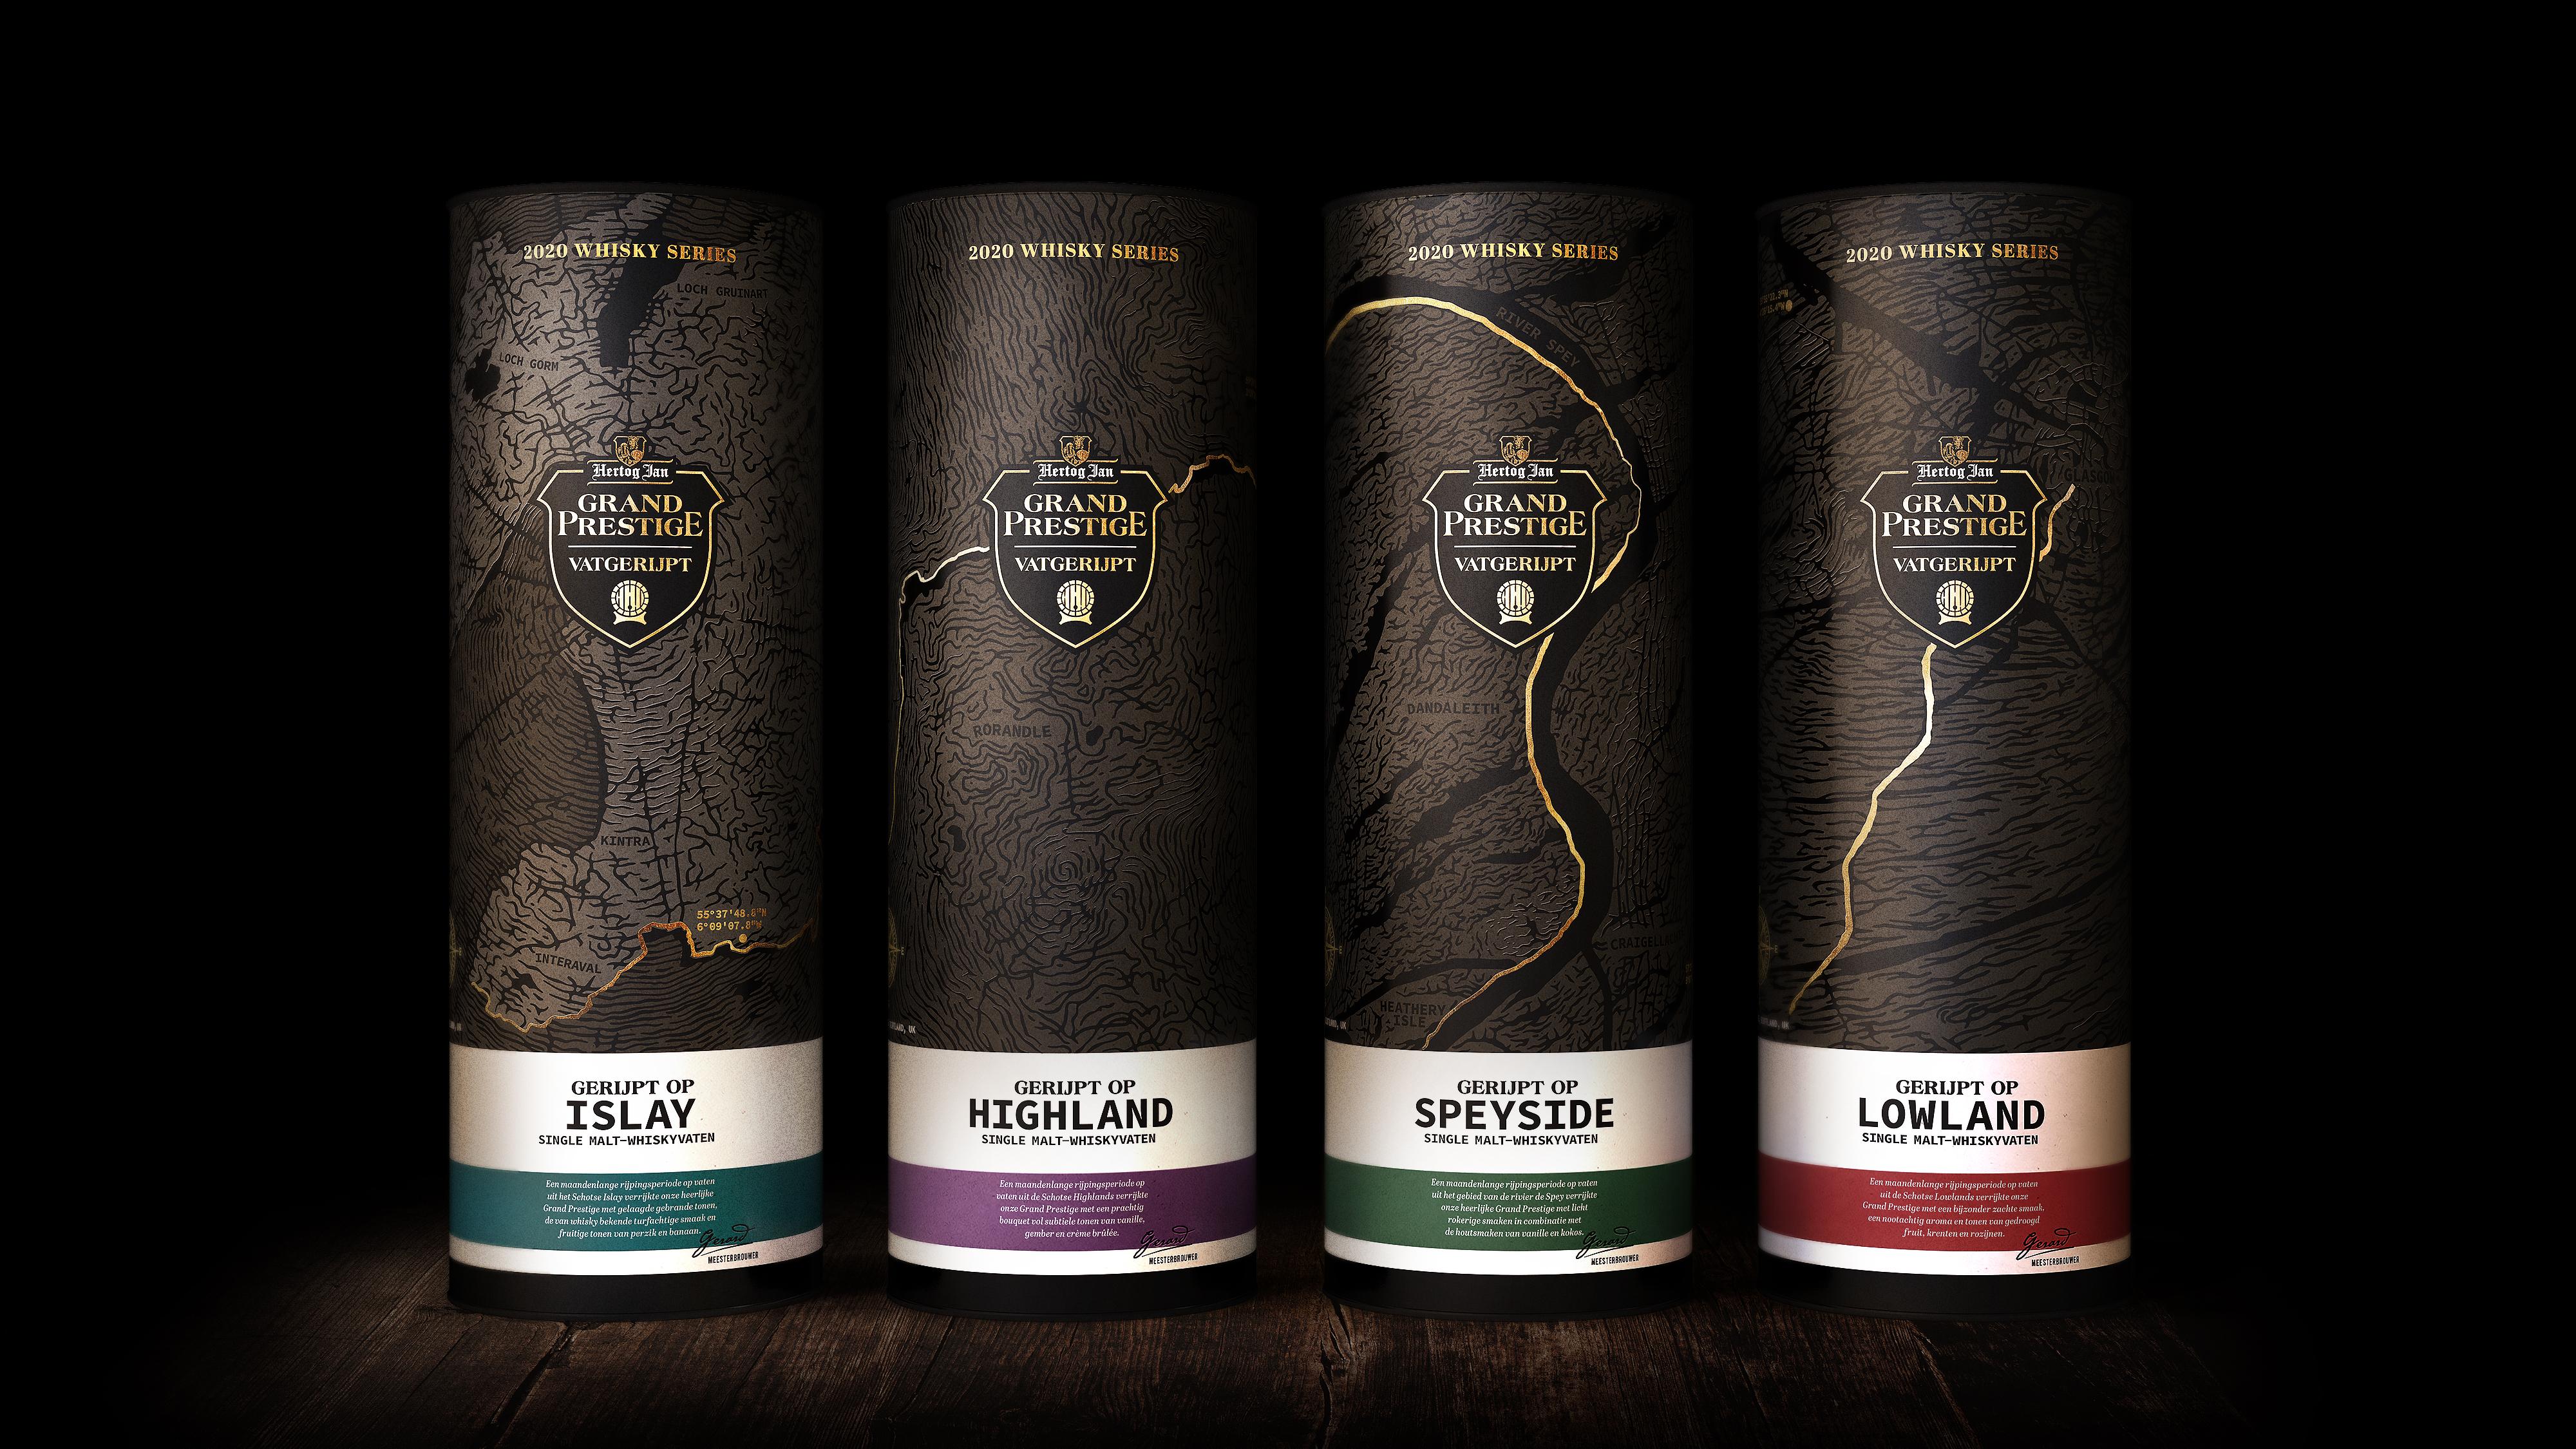 Alcohol Beer Packaging Design - Hertog Jan Grand Prestige Vatgerijpt